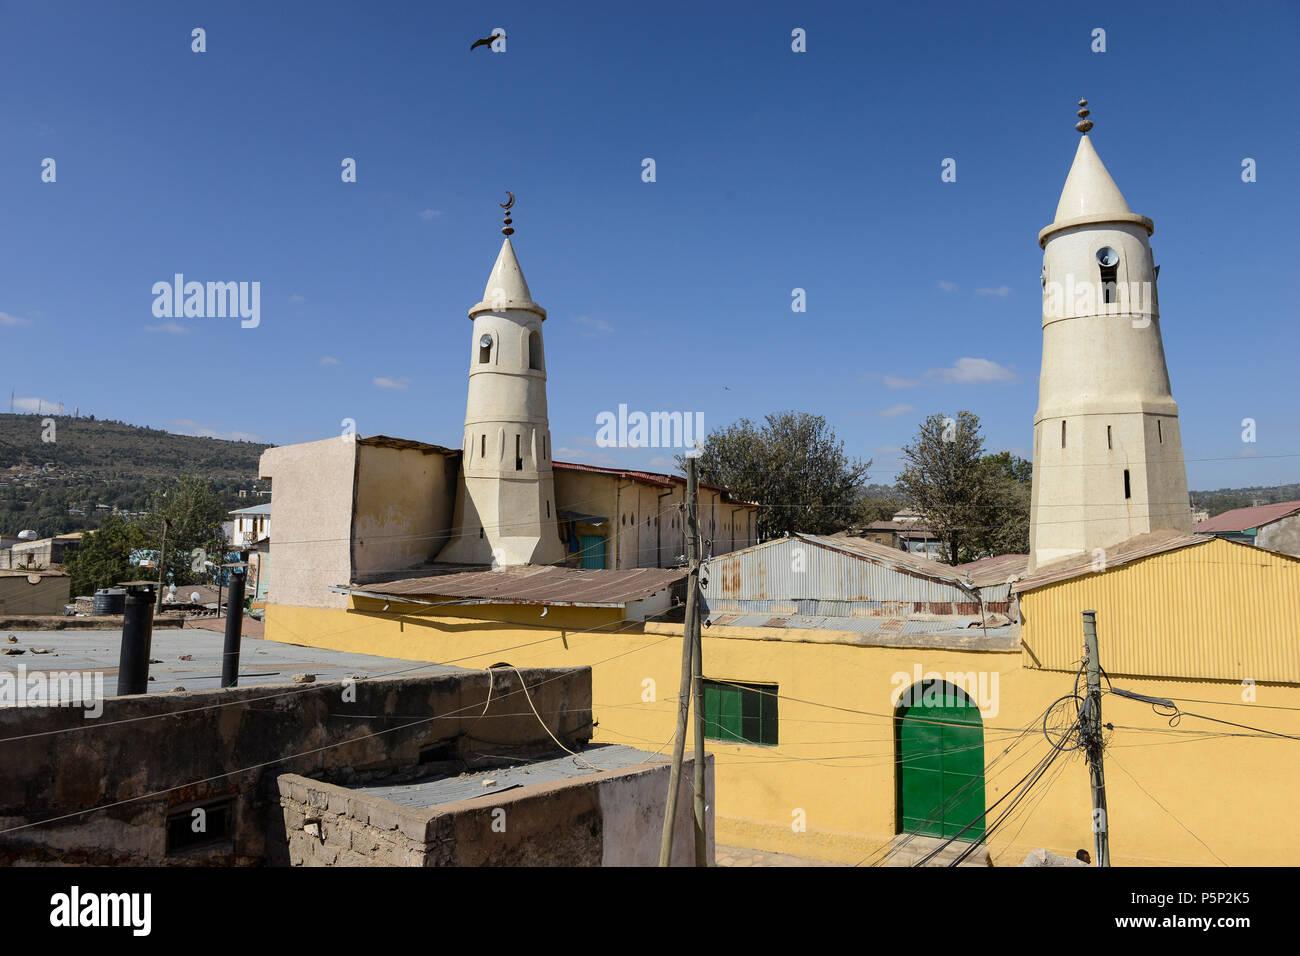 ETHIOPIA , Harar, old town, mosque / AETHIOPIEN, Harar, Altstadt, Moschee - Stock Image